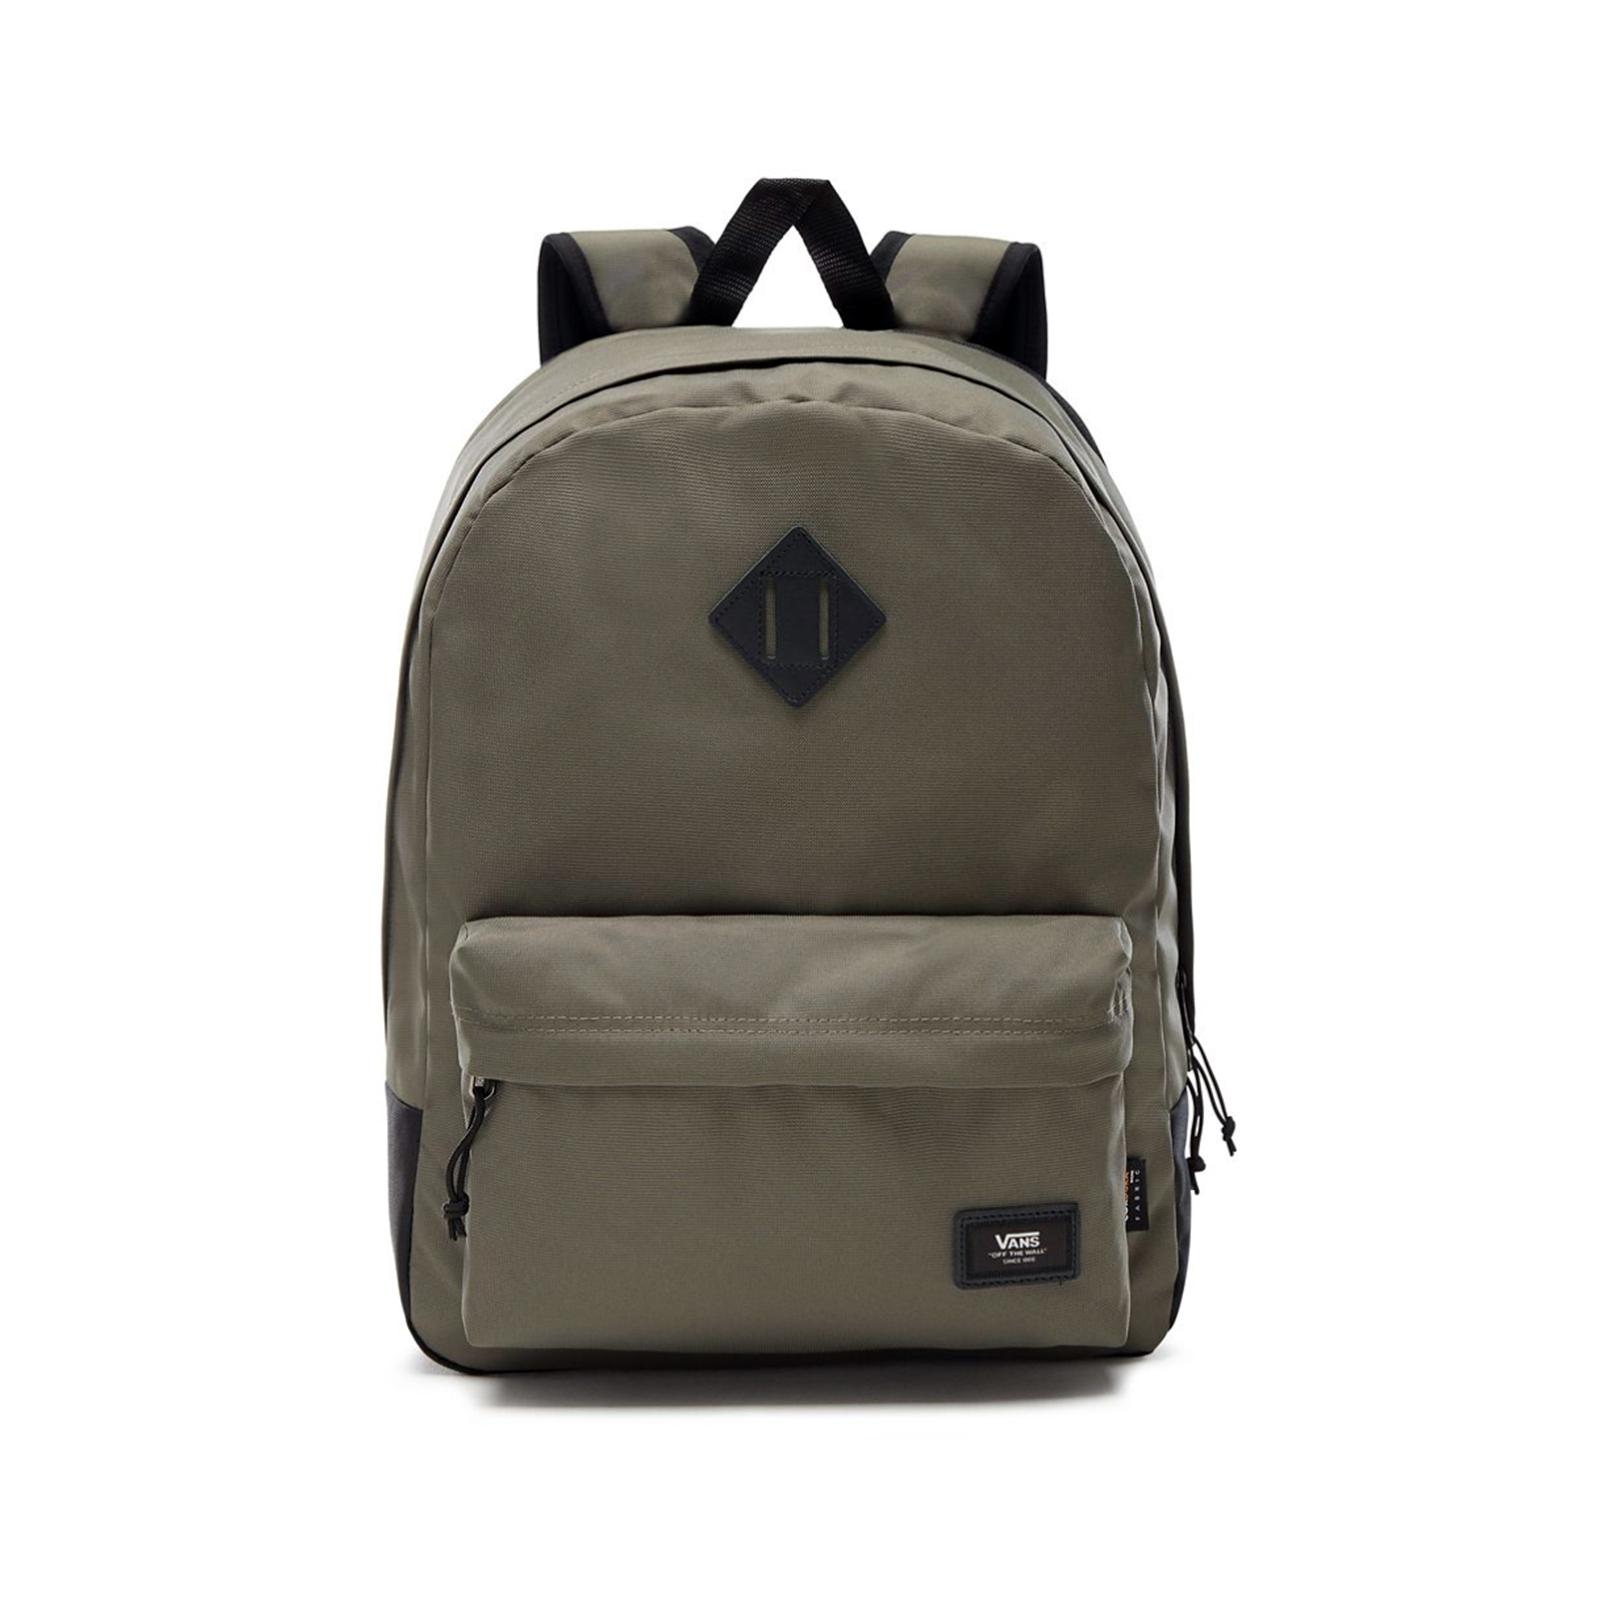 038e01f84f Vans backpacks old skool plus backpack grape leaf black green